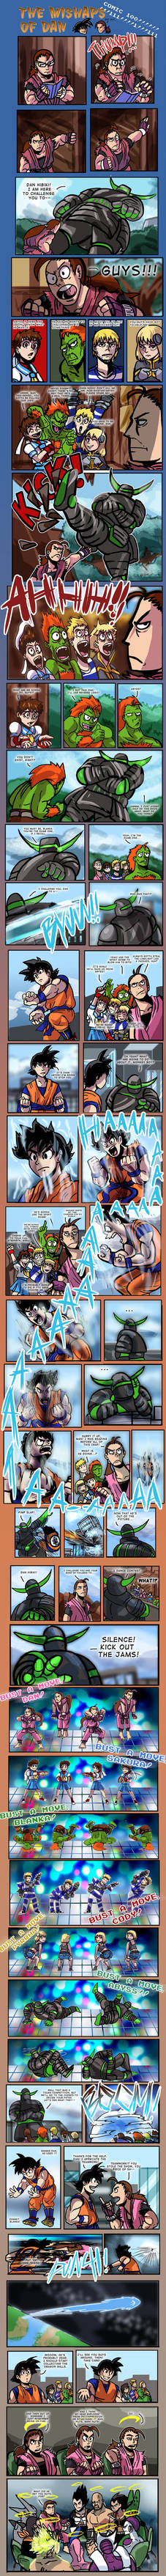 The Mishaps of Dan 100: The Super Comic!!!!